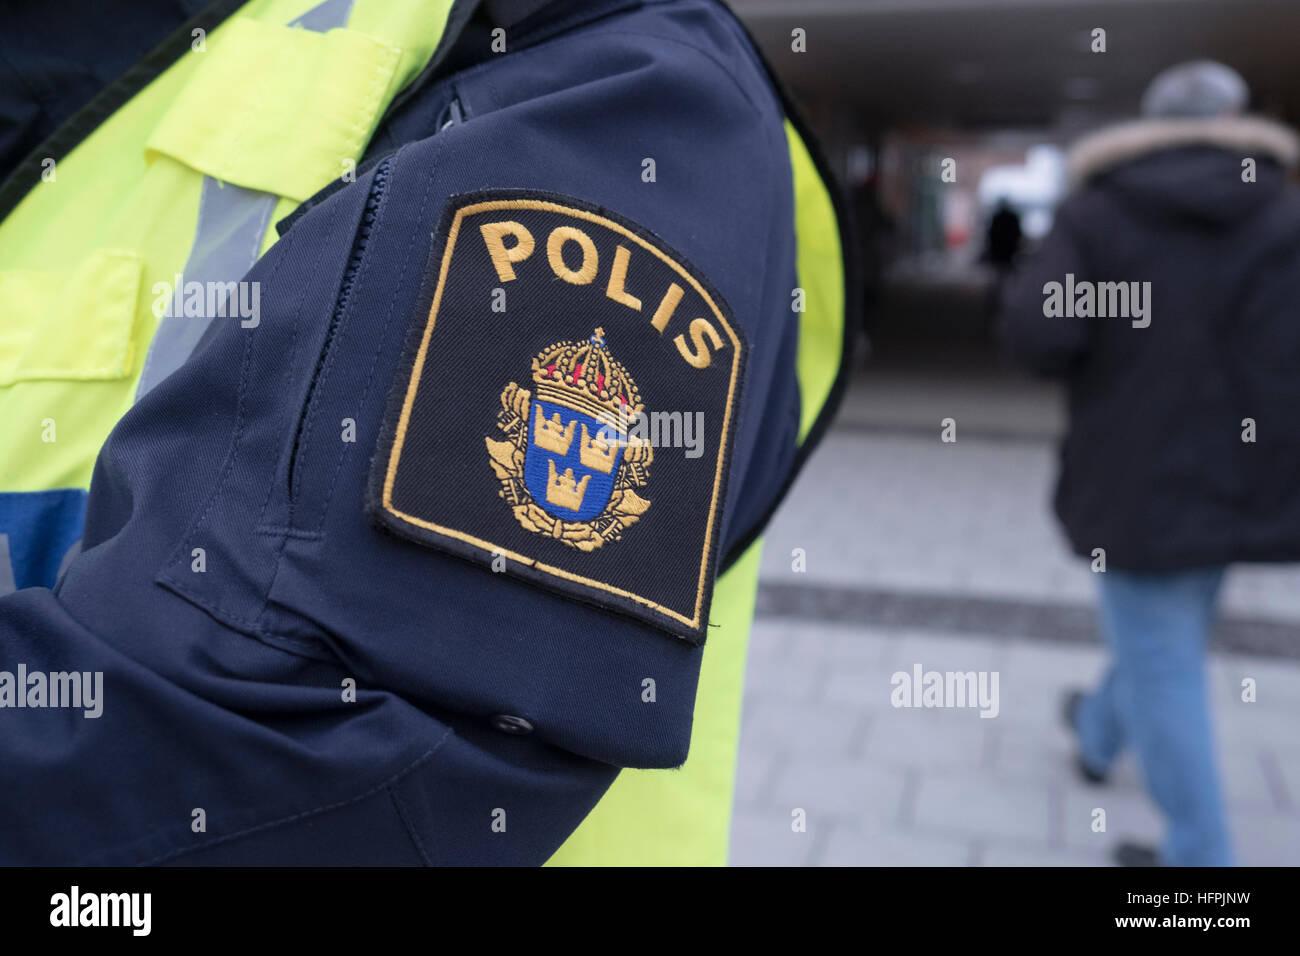 Police badge. - Stock Image